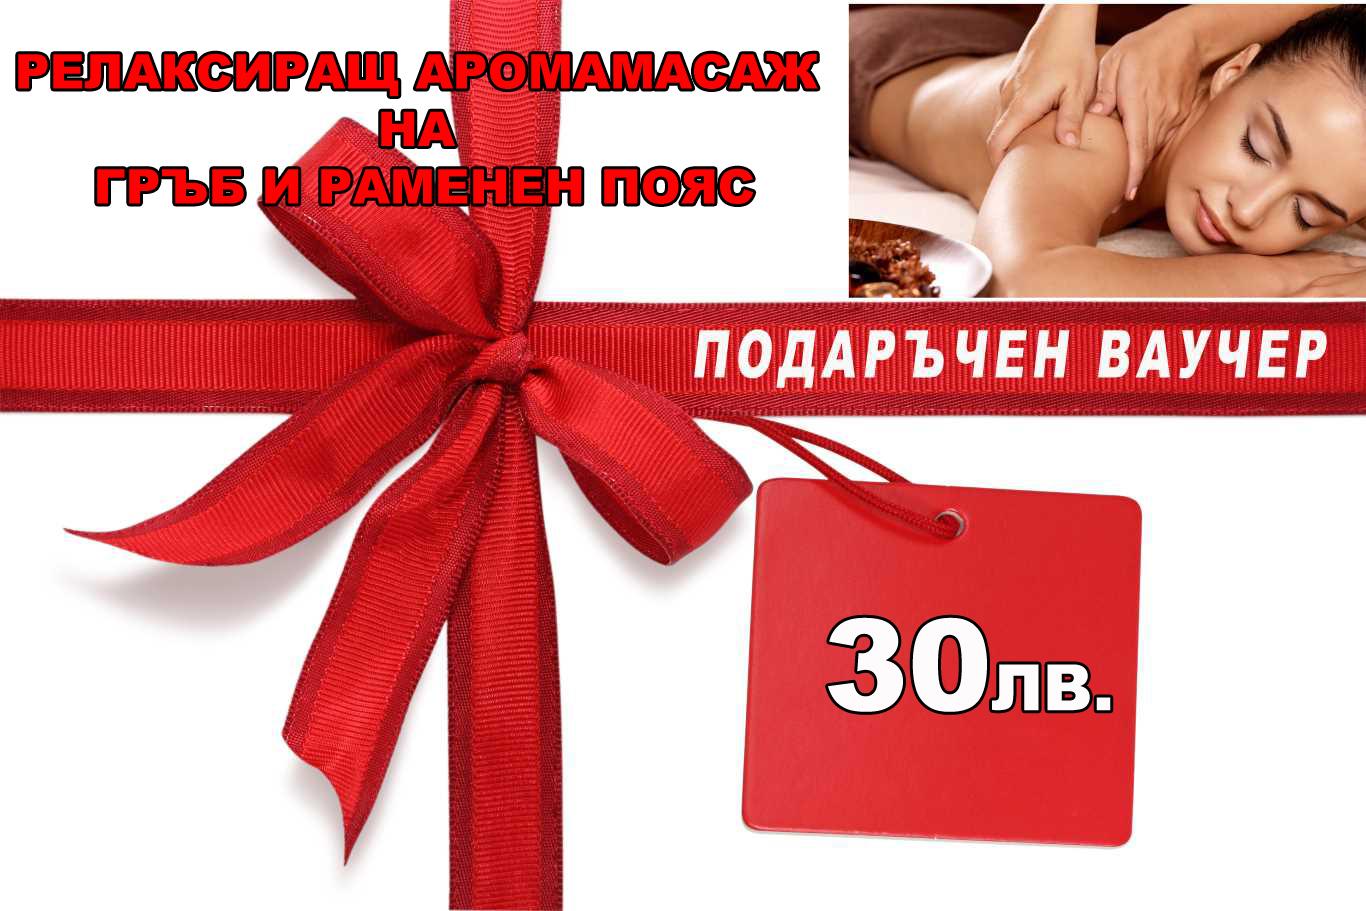 Podaruchen_vaucher_masage_lice+tqlo